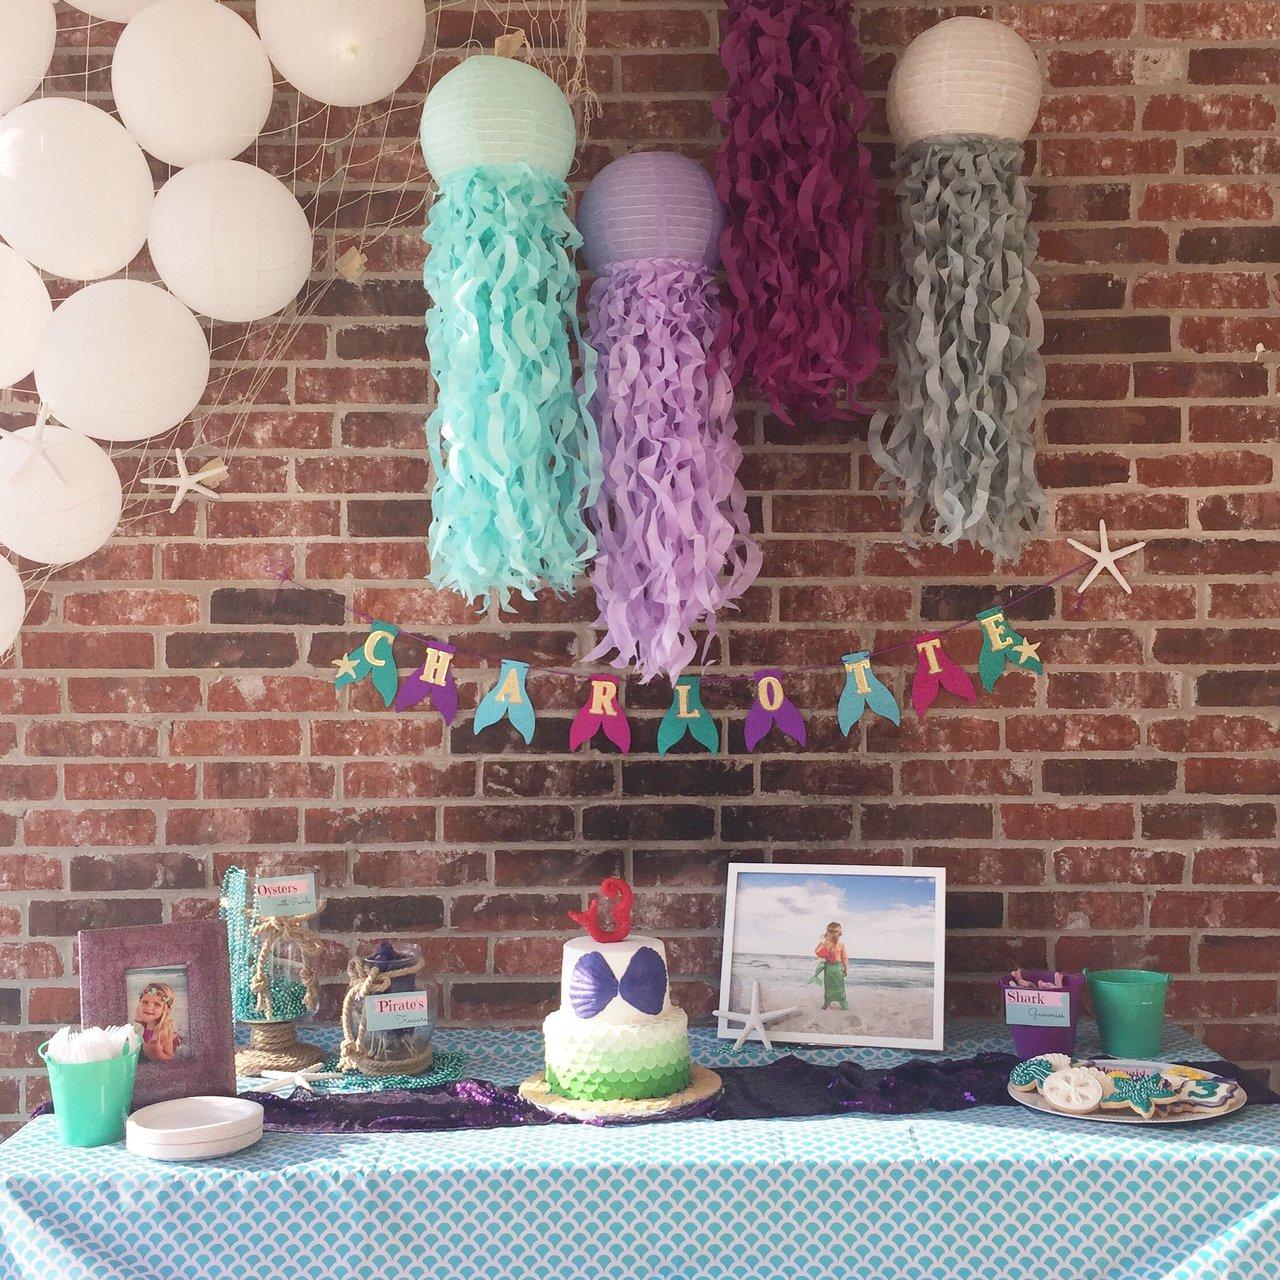 Birthday Party photo customerpic thanks.jpg